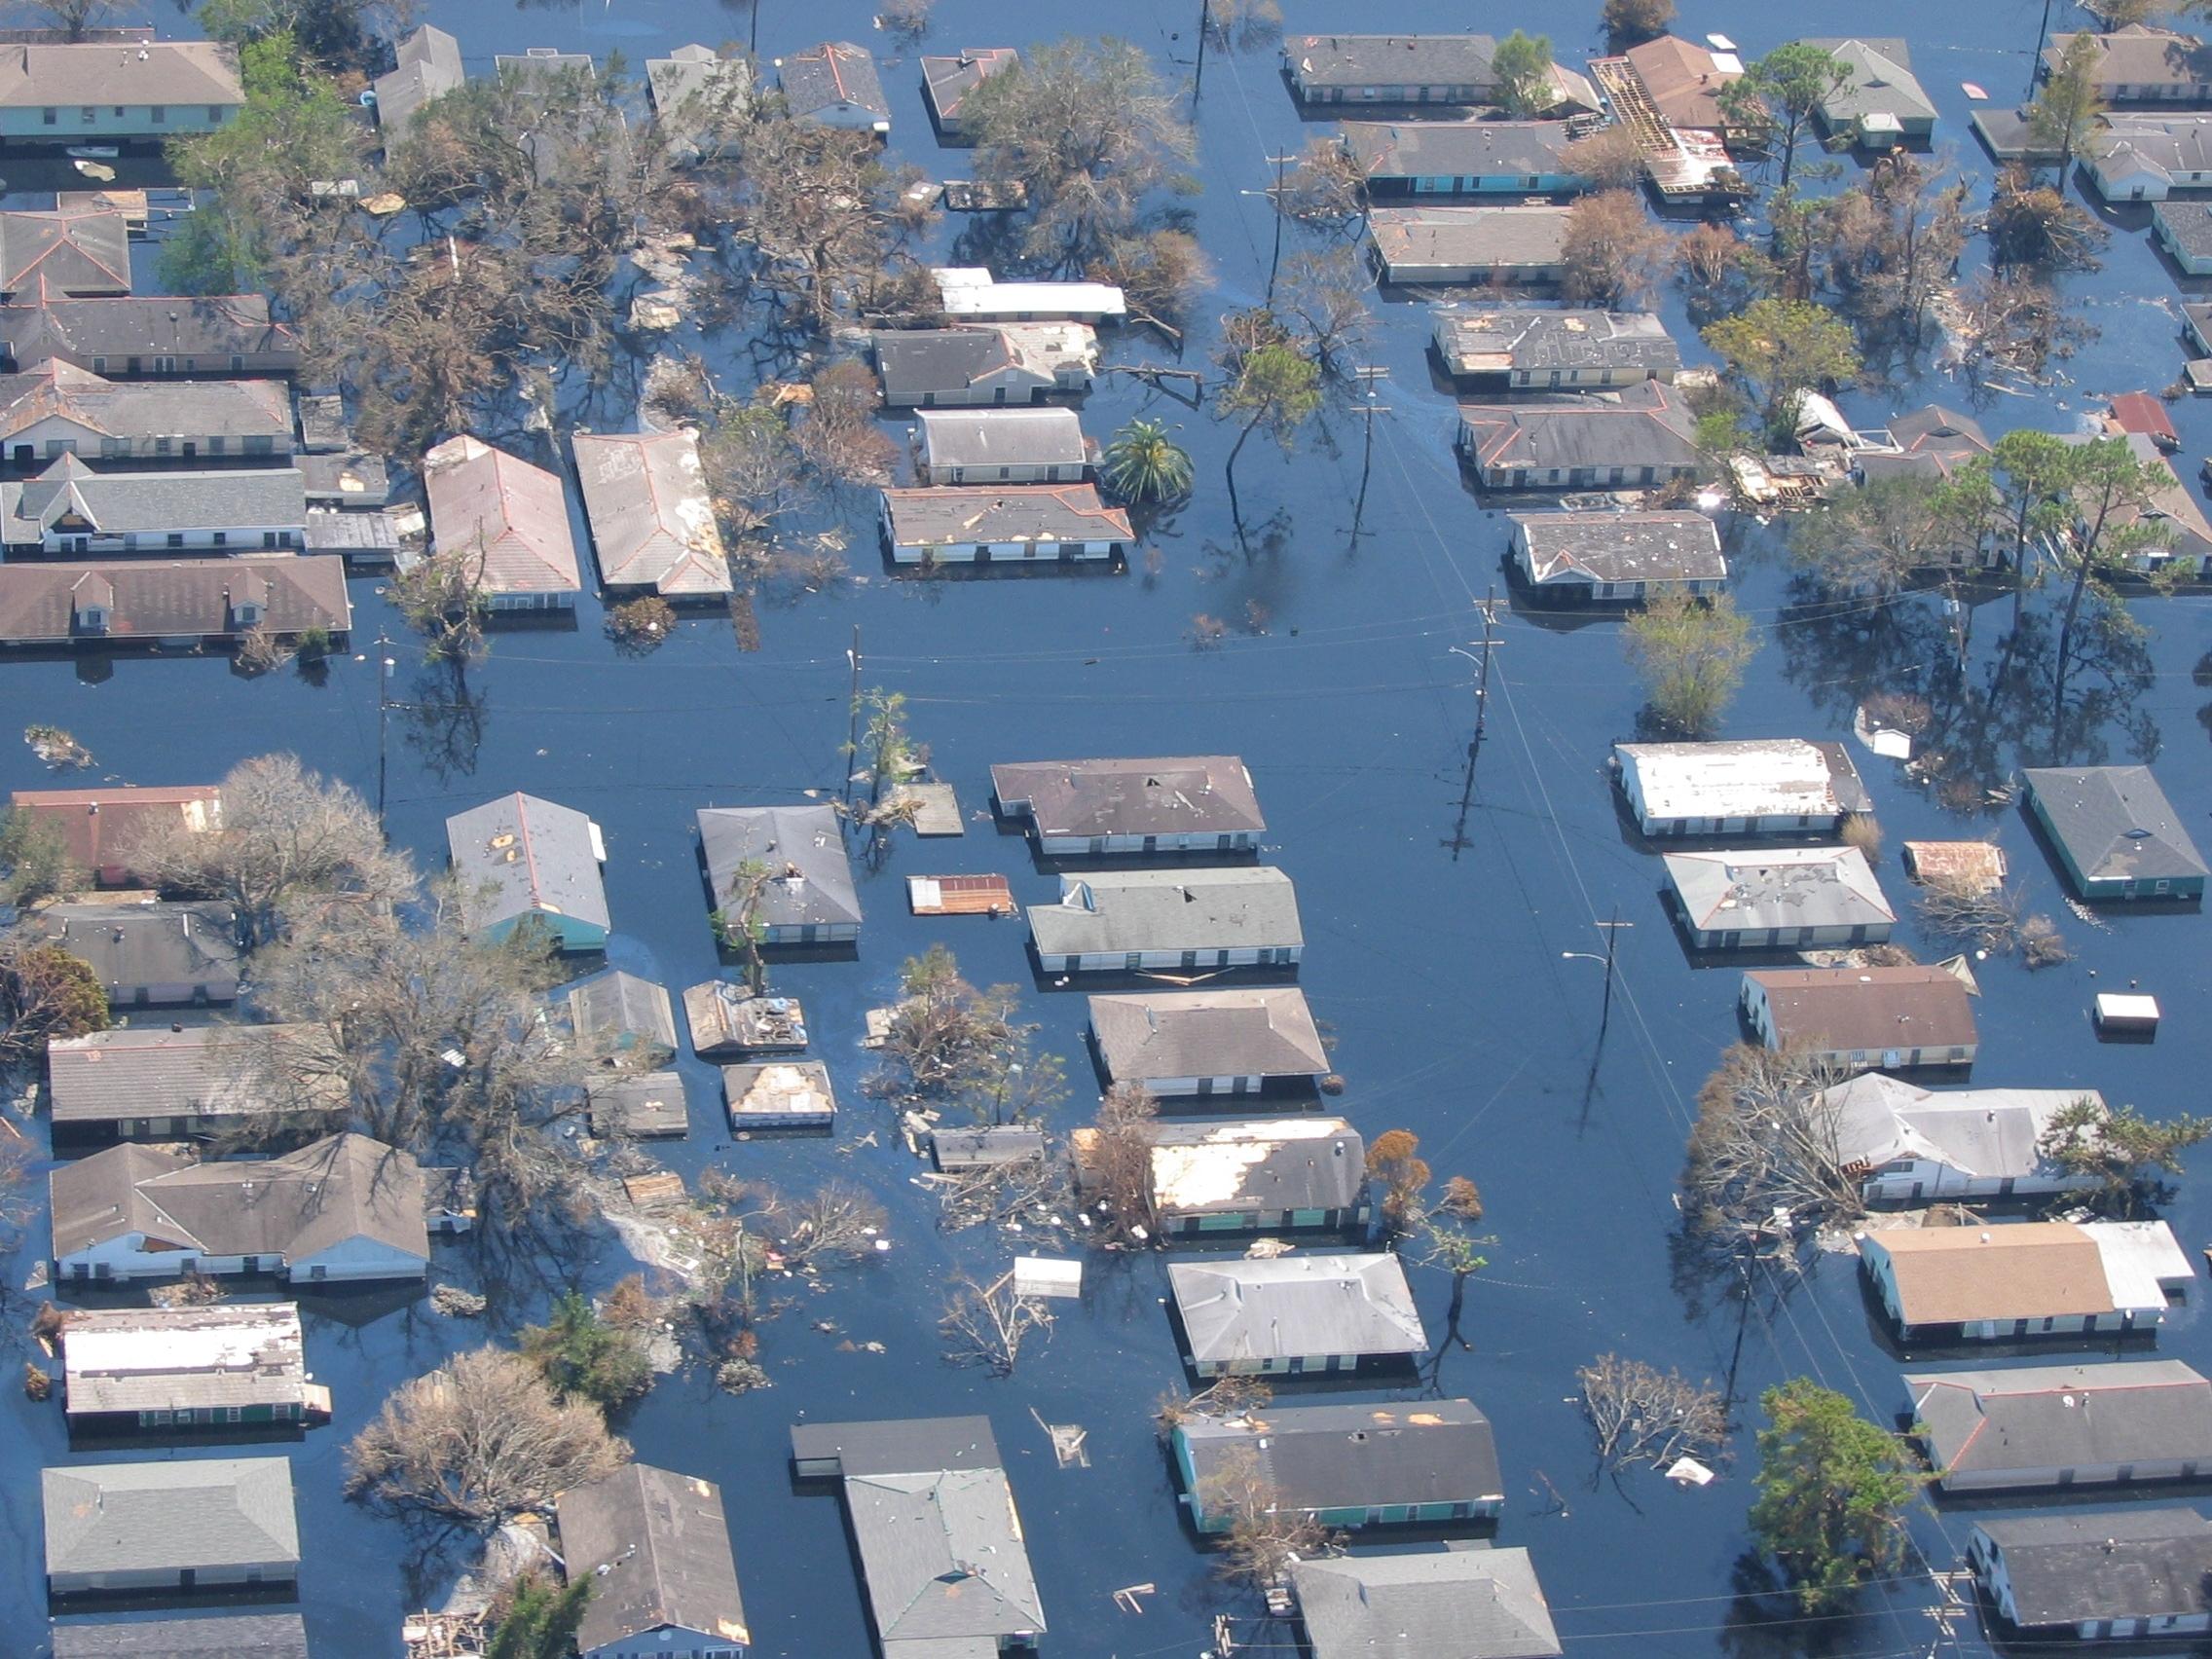 Hurricane Katrina flooding in New Orleans